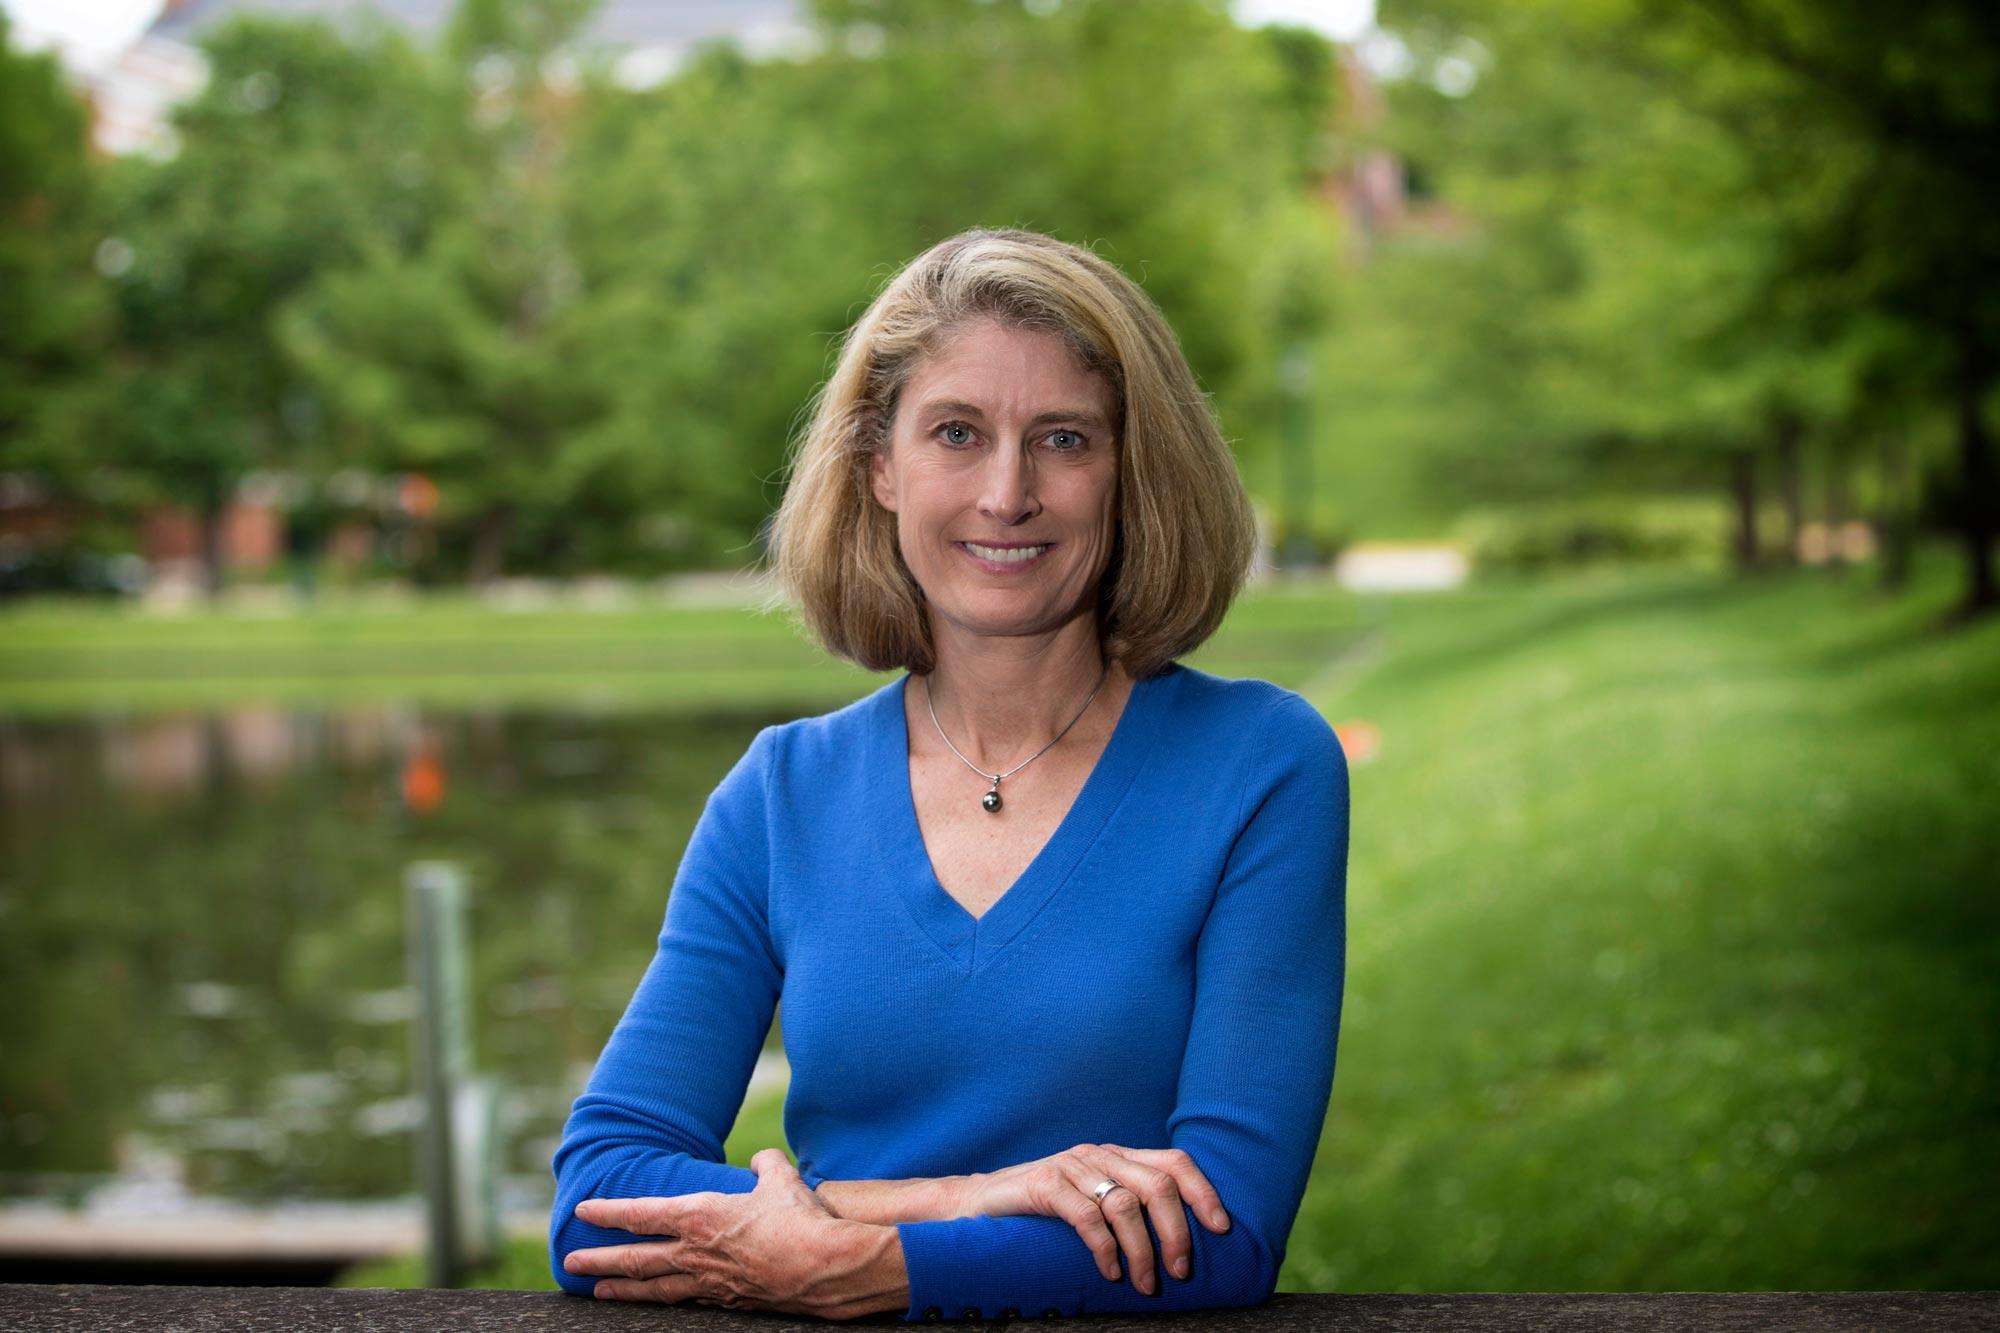 Environmental sciences professor Karen McGlathery is leading the new UVA Environmental Resilience Institute.